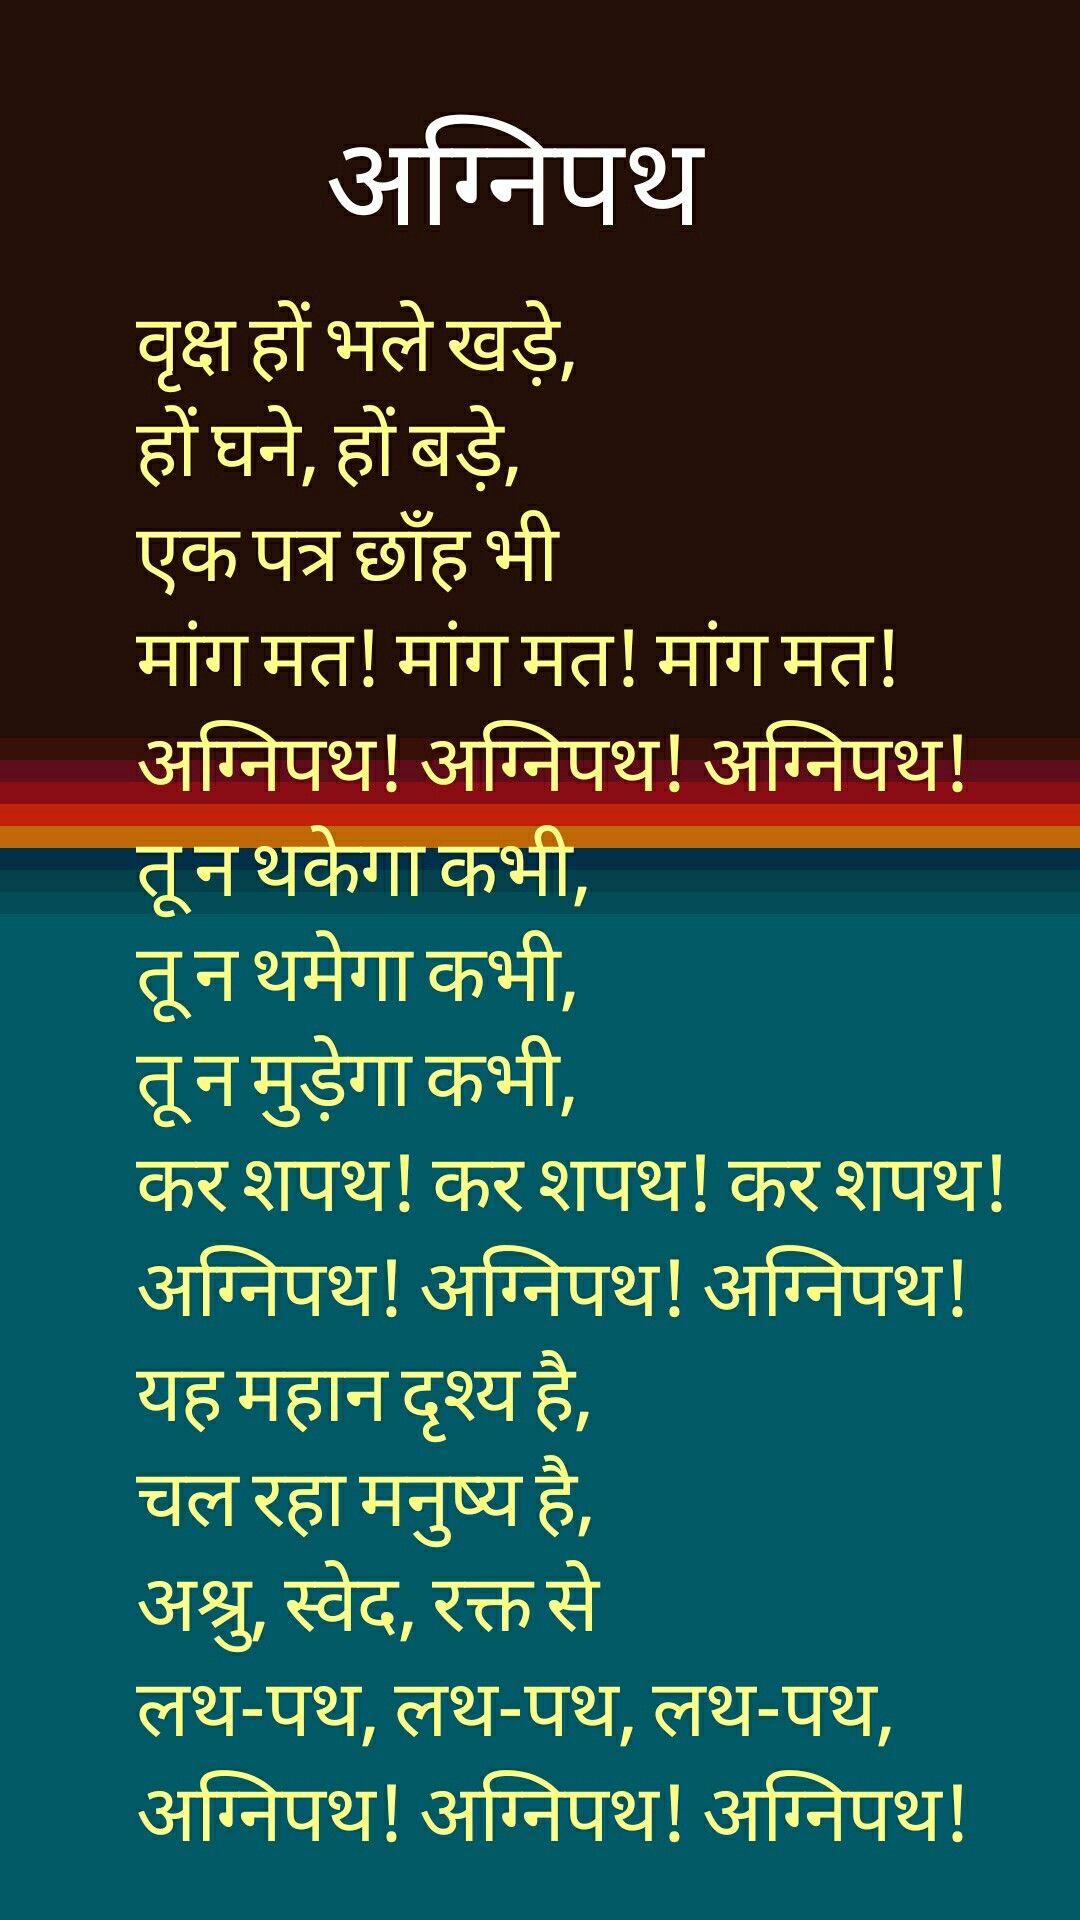 Agnipath Hindi Poem Kavita Harvivansharaybacchan Agnipath